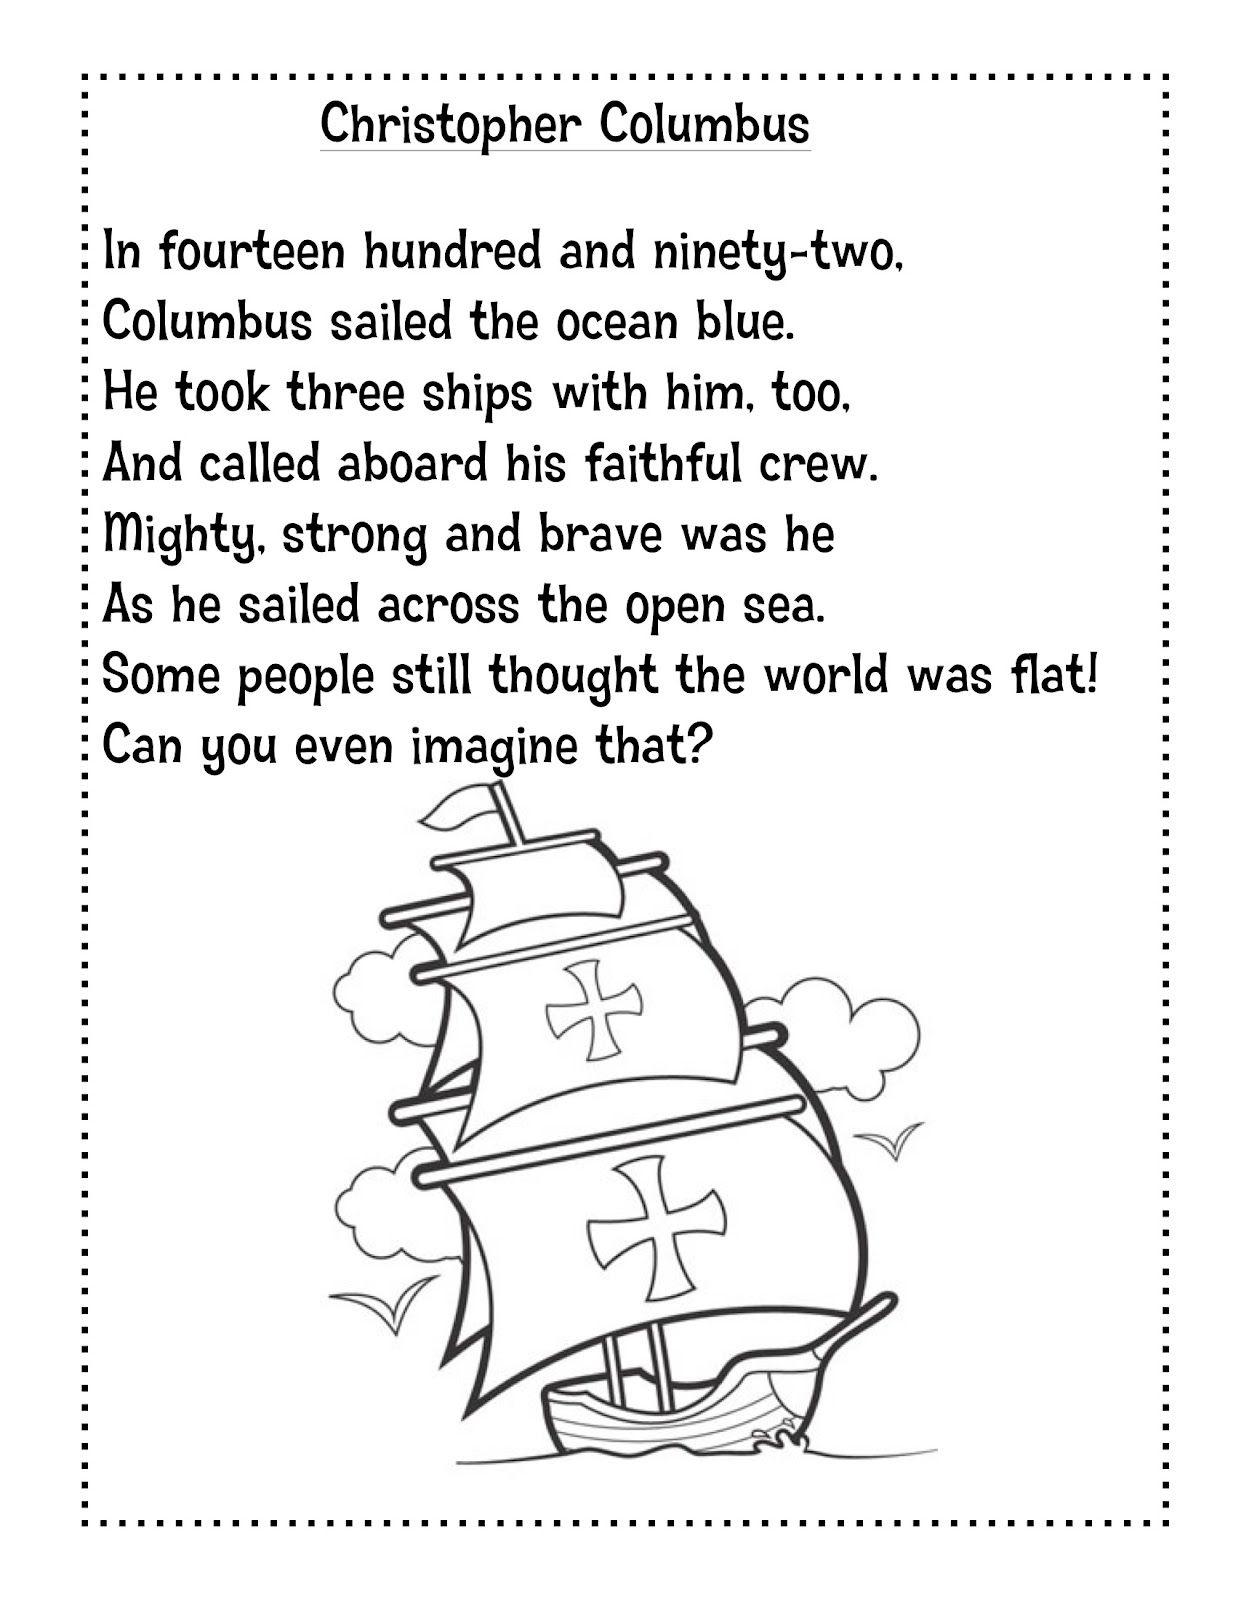 Kids Poem About Christopher Columbus   First grade phonics [ 1600 x 1236 Pixel ]